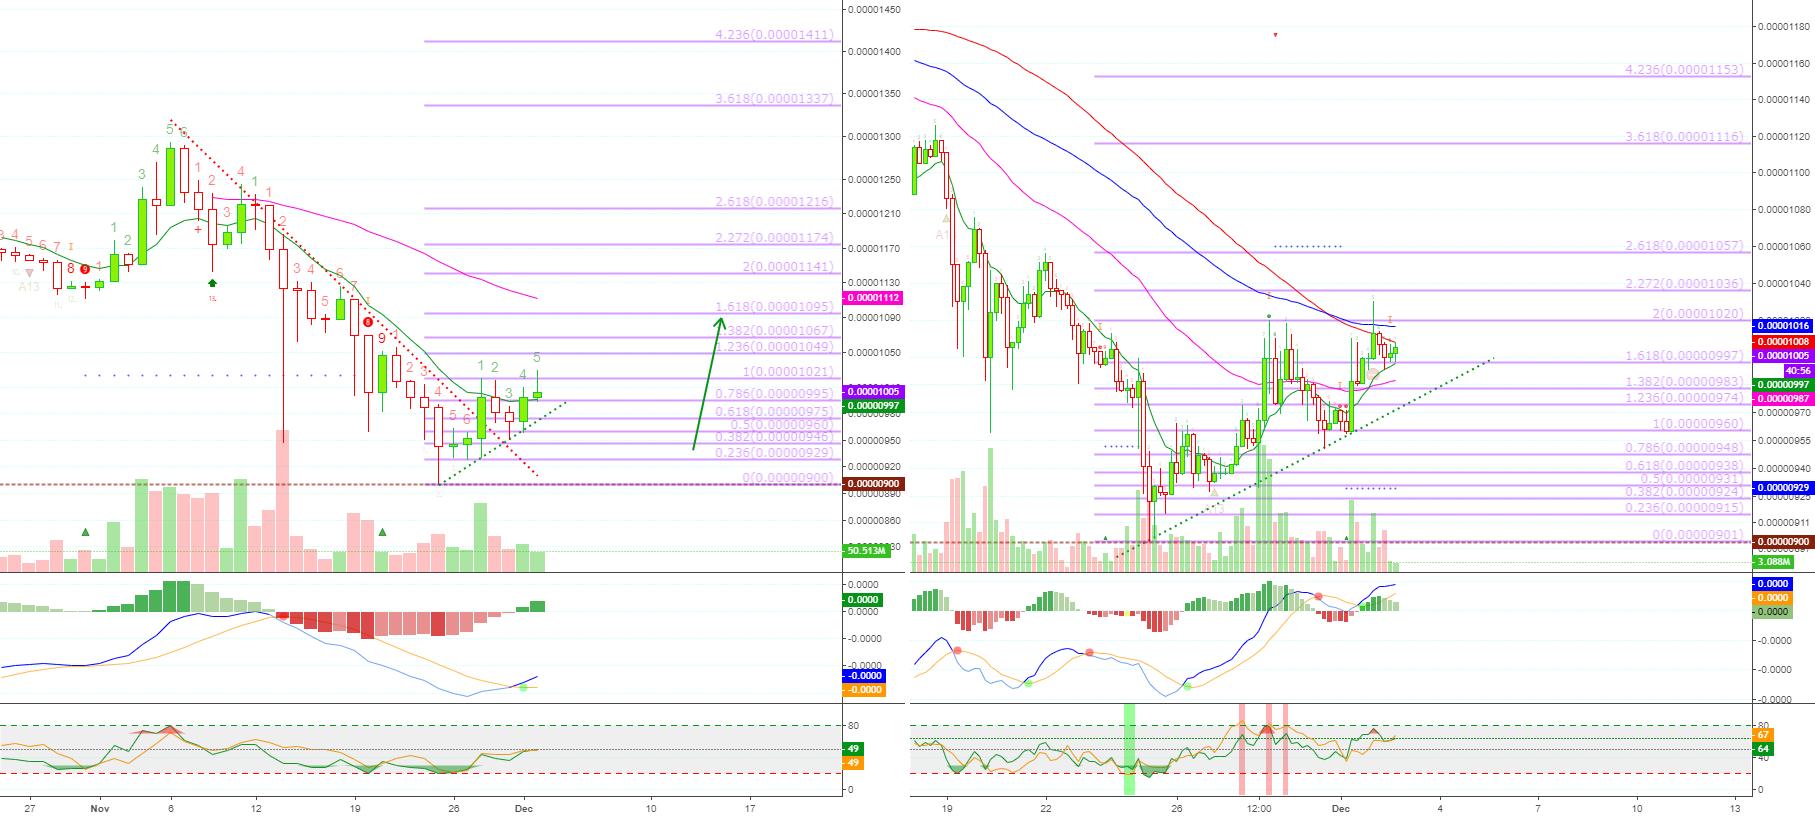 ADAZ18] BitMex Cardano Trade Signal [33 33%+ ROE] for BITMEX:ADAZ18